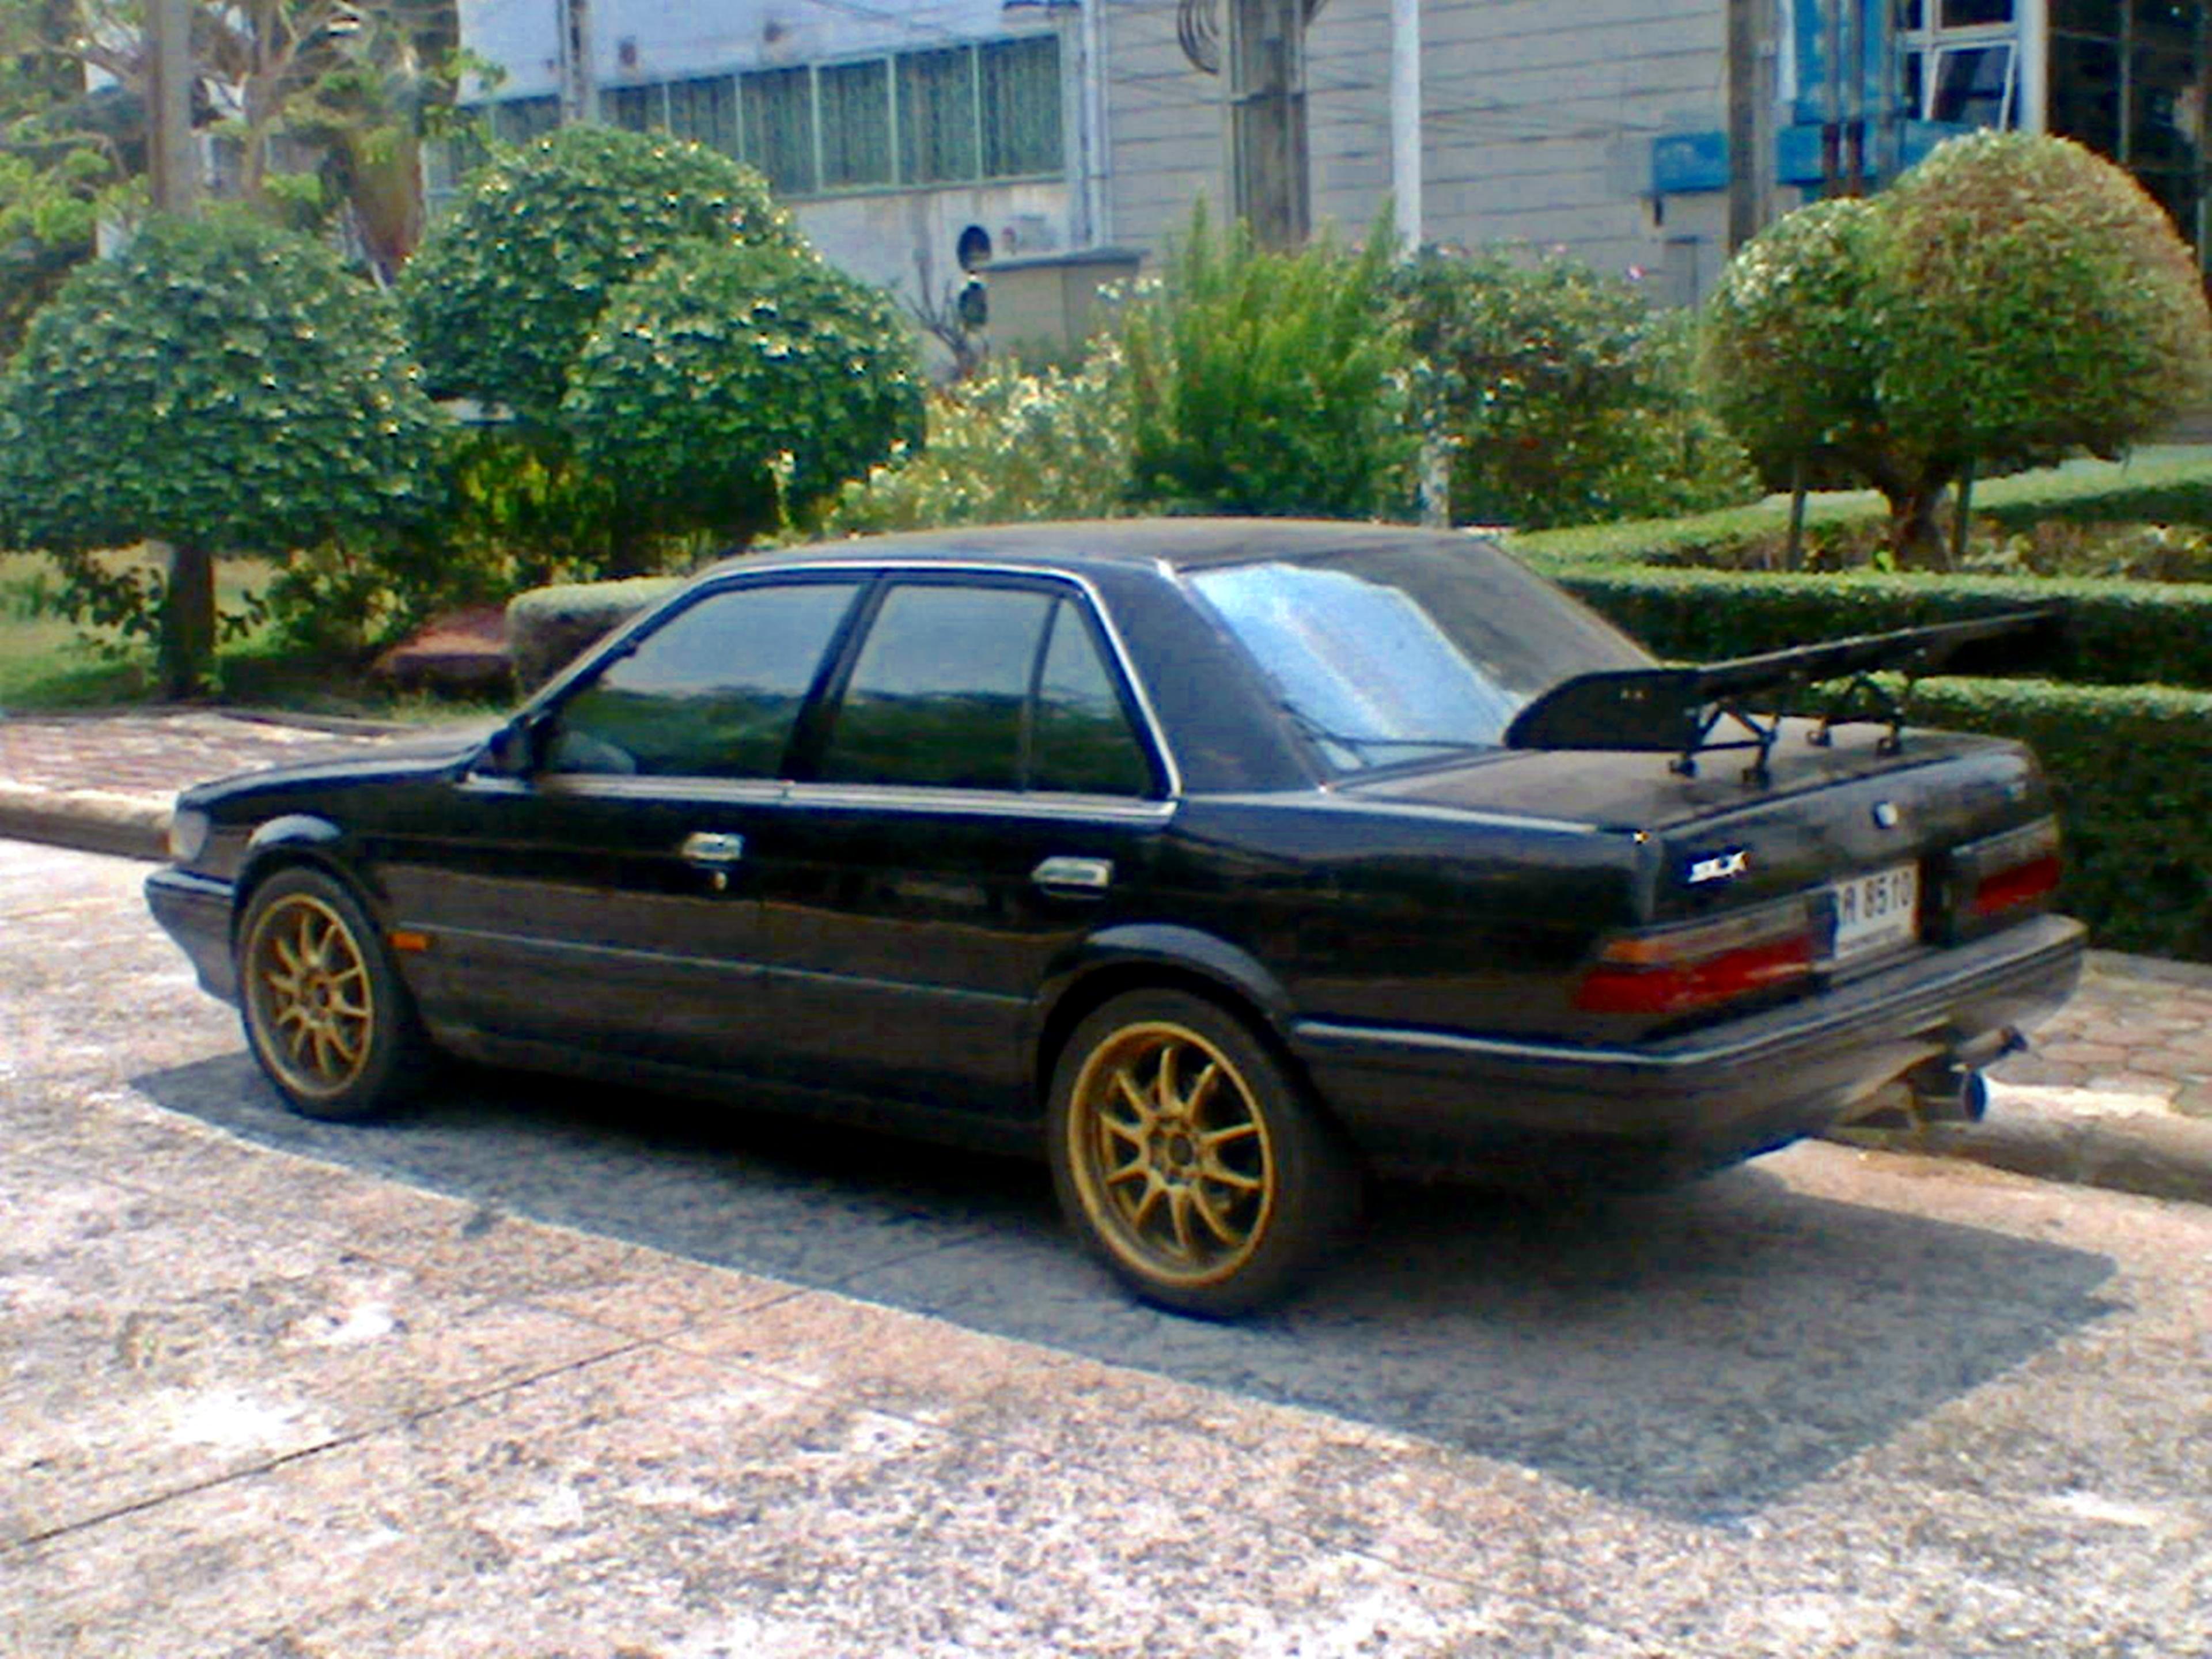 File:Tuned Nissan Bluebird 2 0 i Super Select Saloon 1989